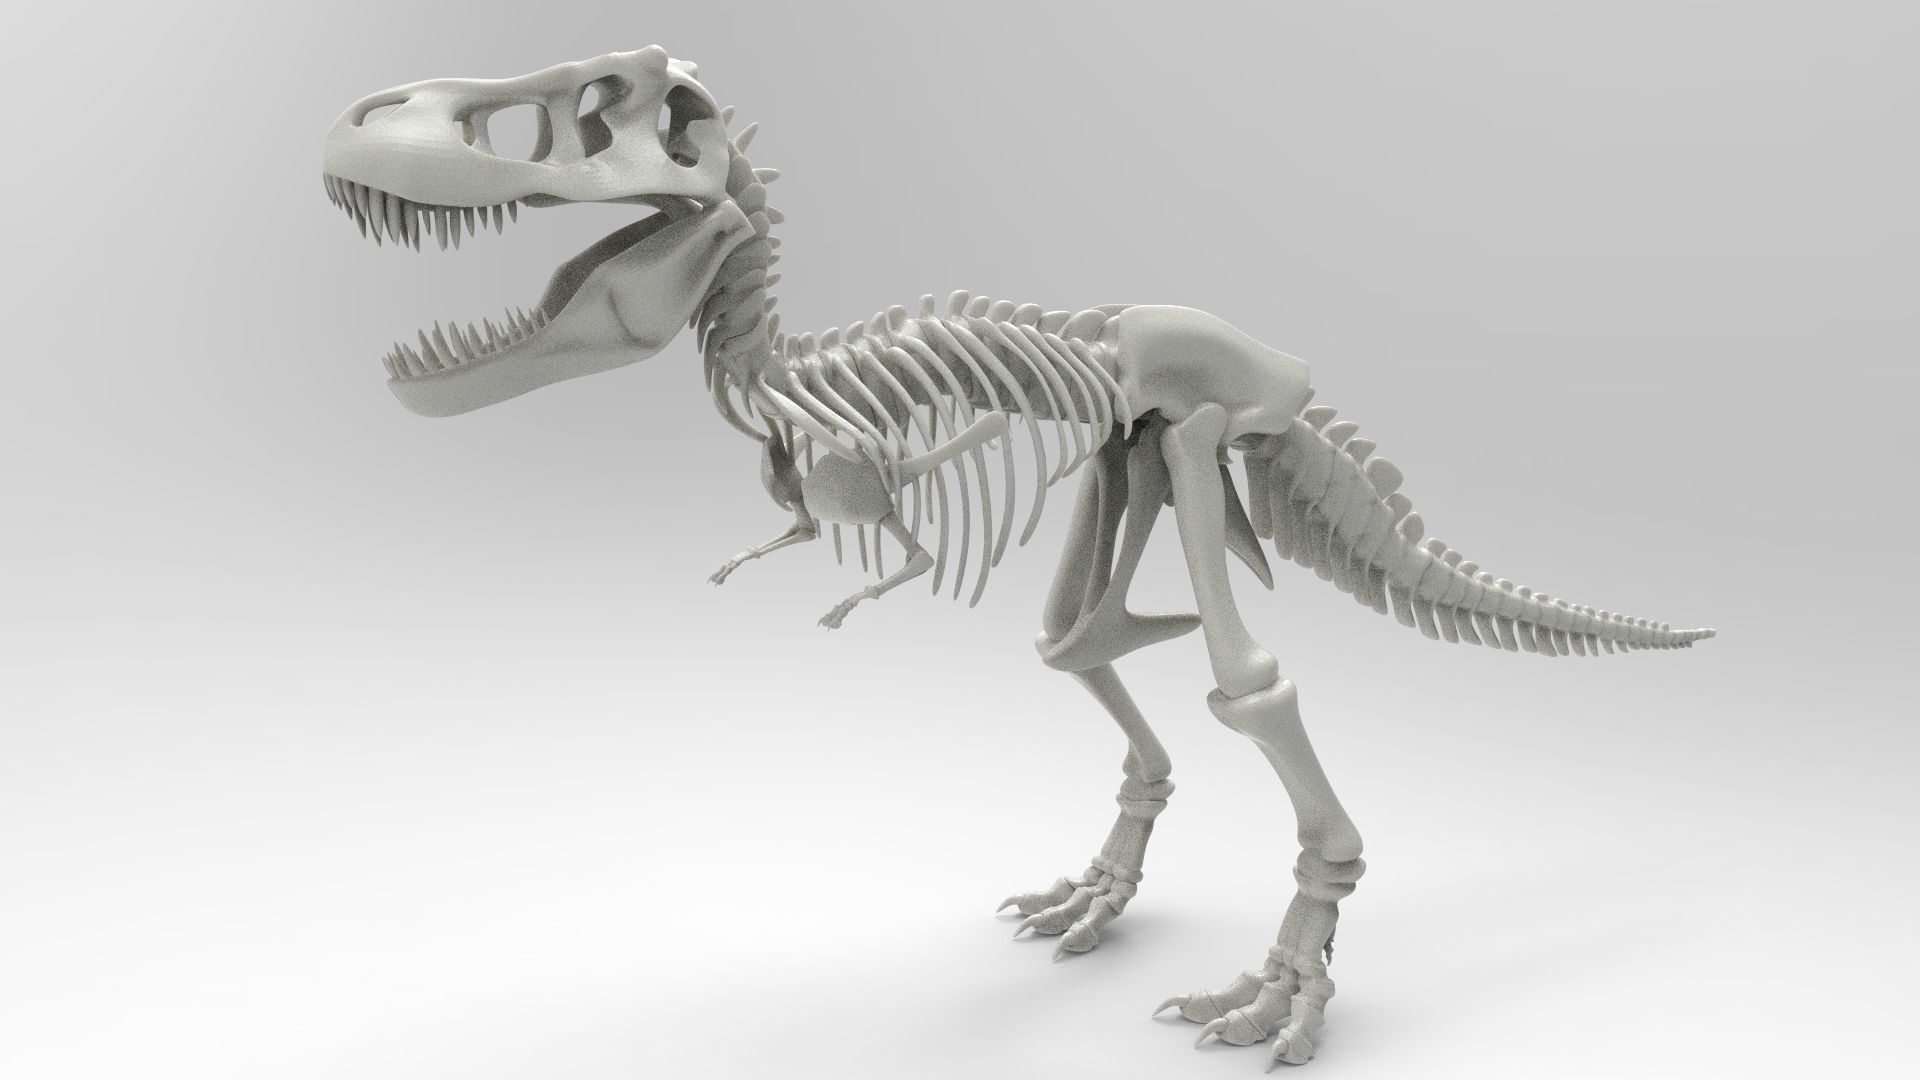 graphic regarding Tyrannosaurus Rex Printable named Tyrannosaurus Rex Skeleton 3D Print Style